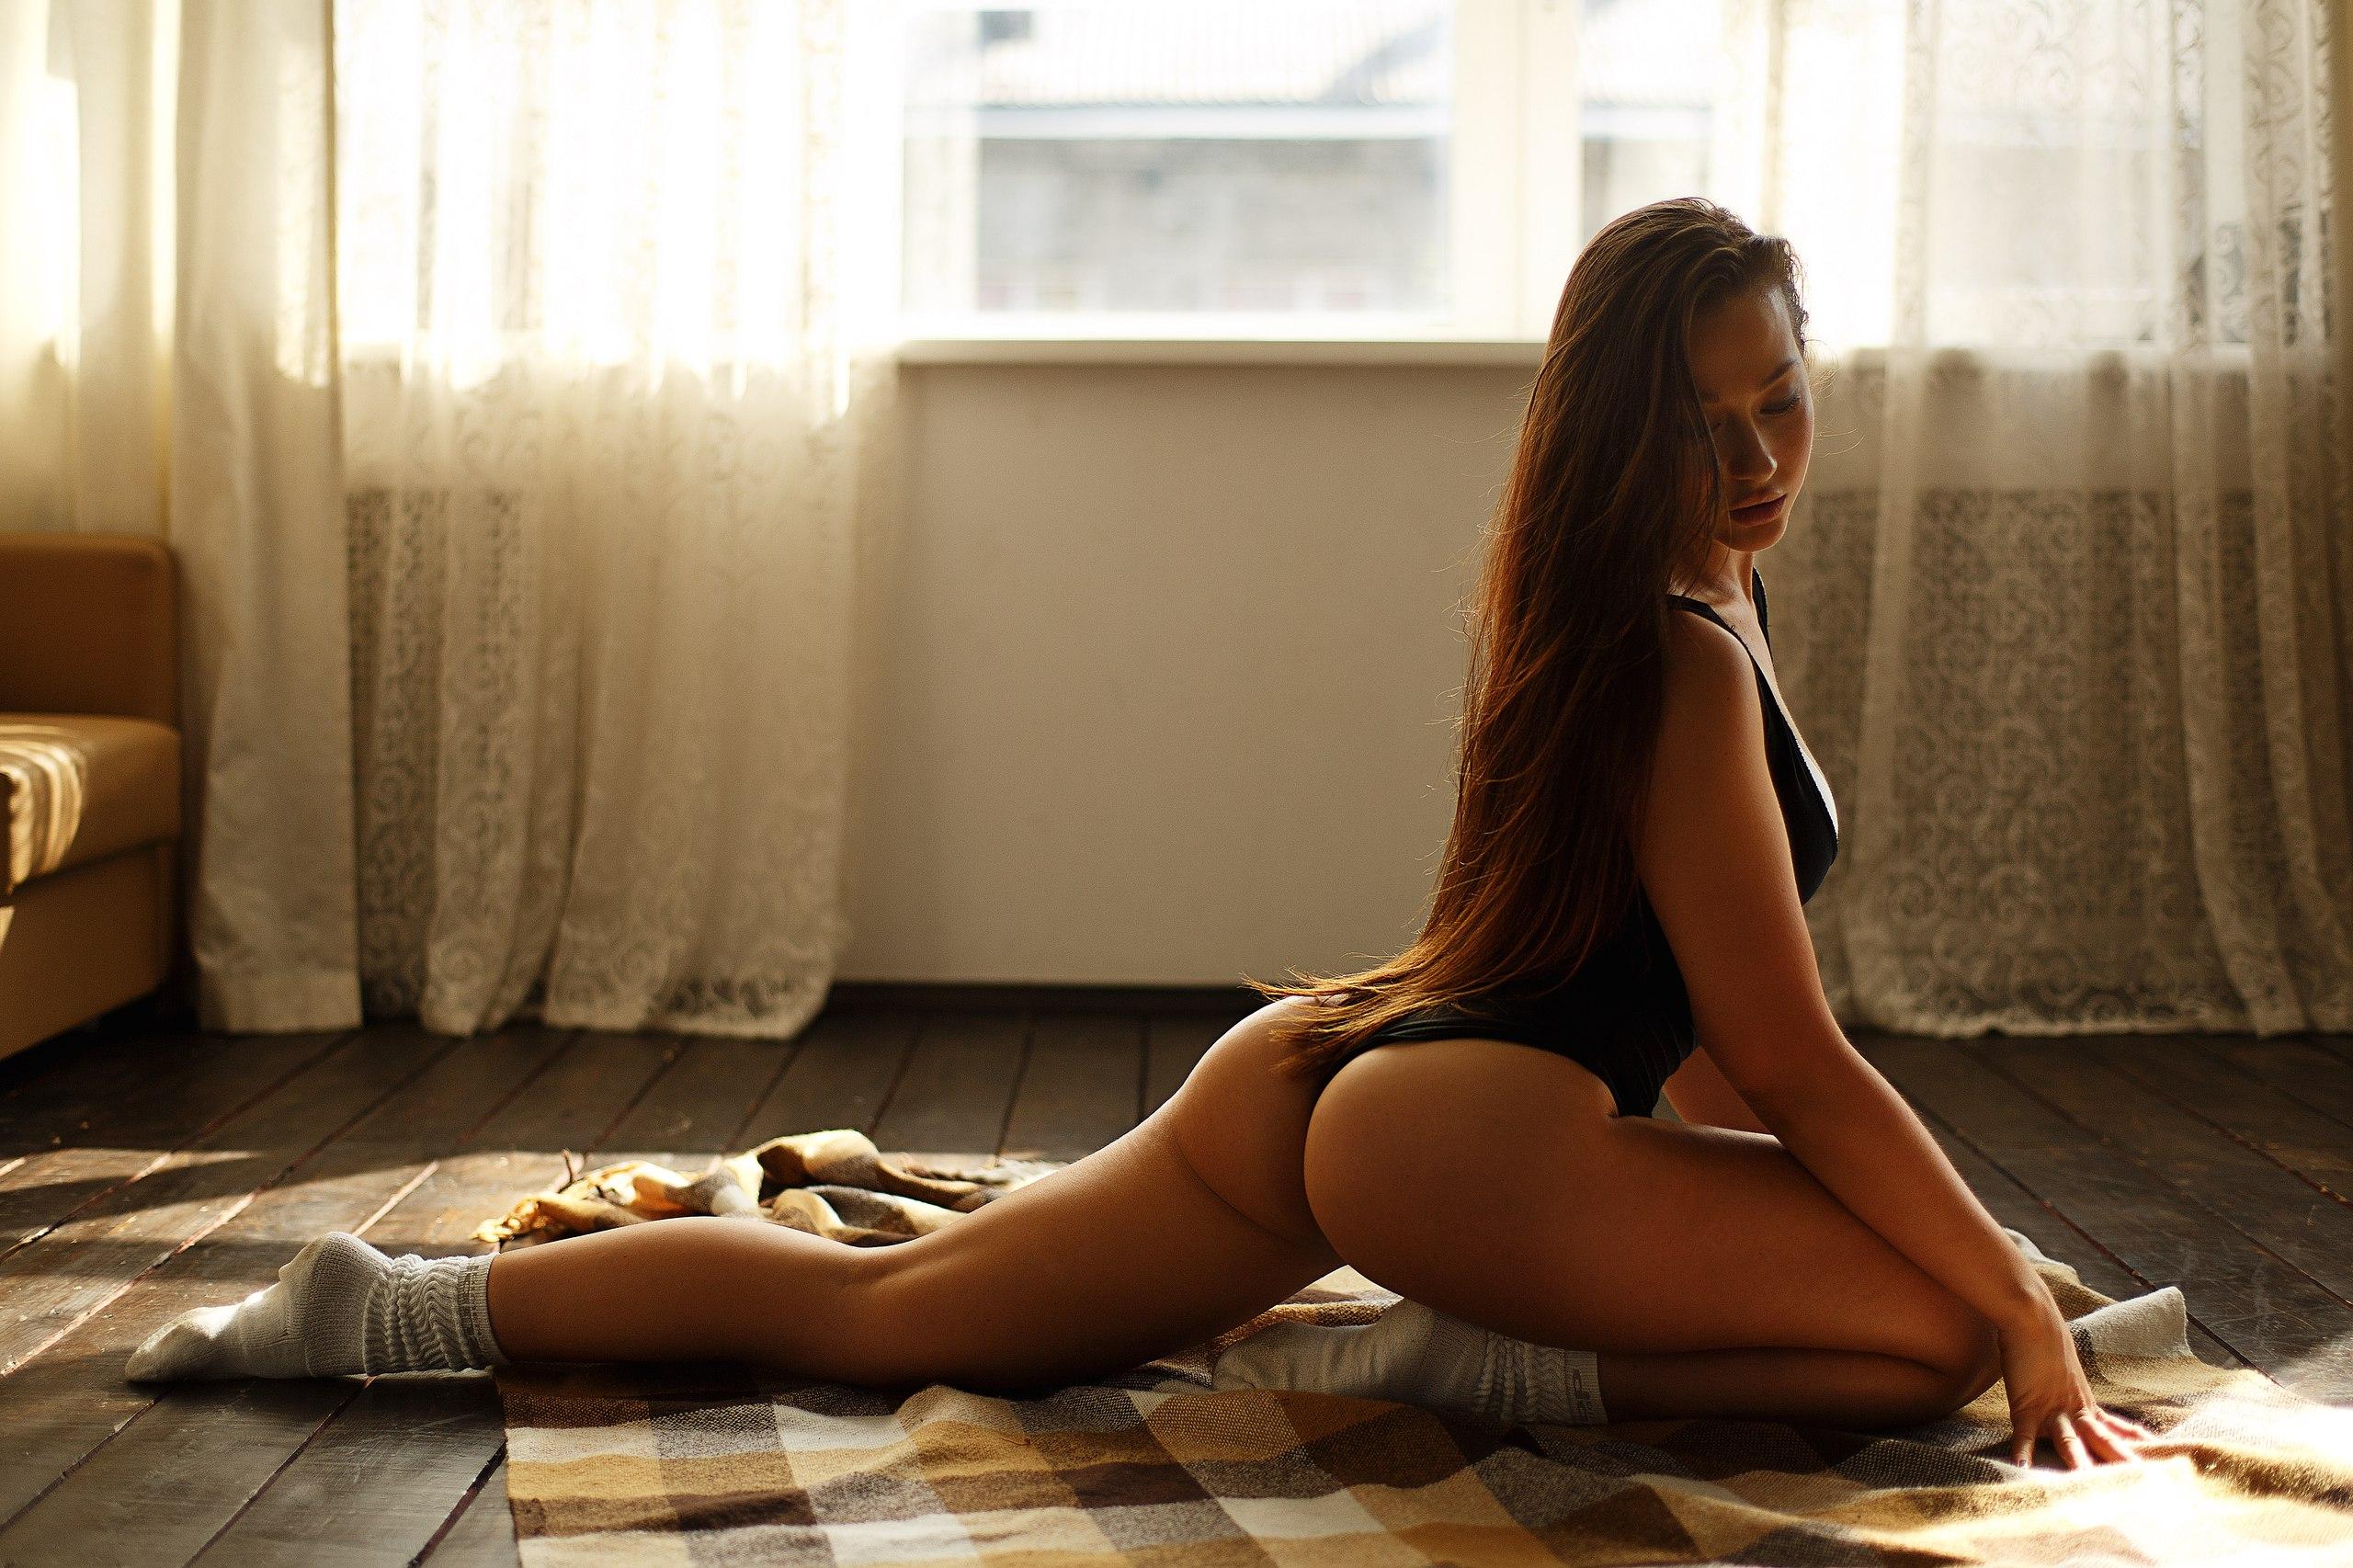 People 2560x1706 women model brunette long hair closed eyes side view bodysuit ass kneeling socks on the floor indoors women indoors slouch socks gray socks